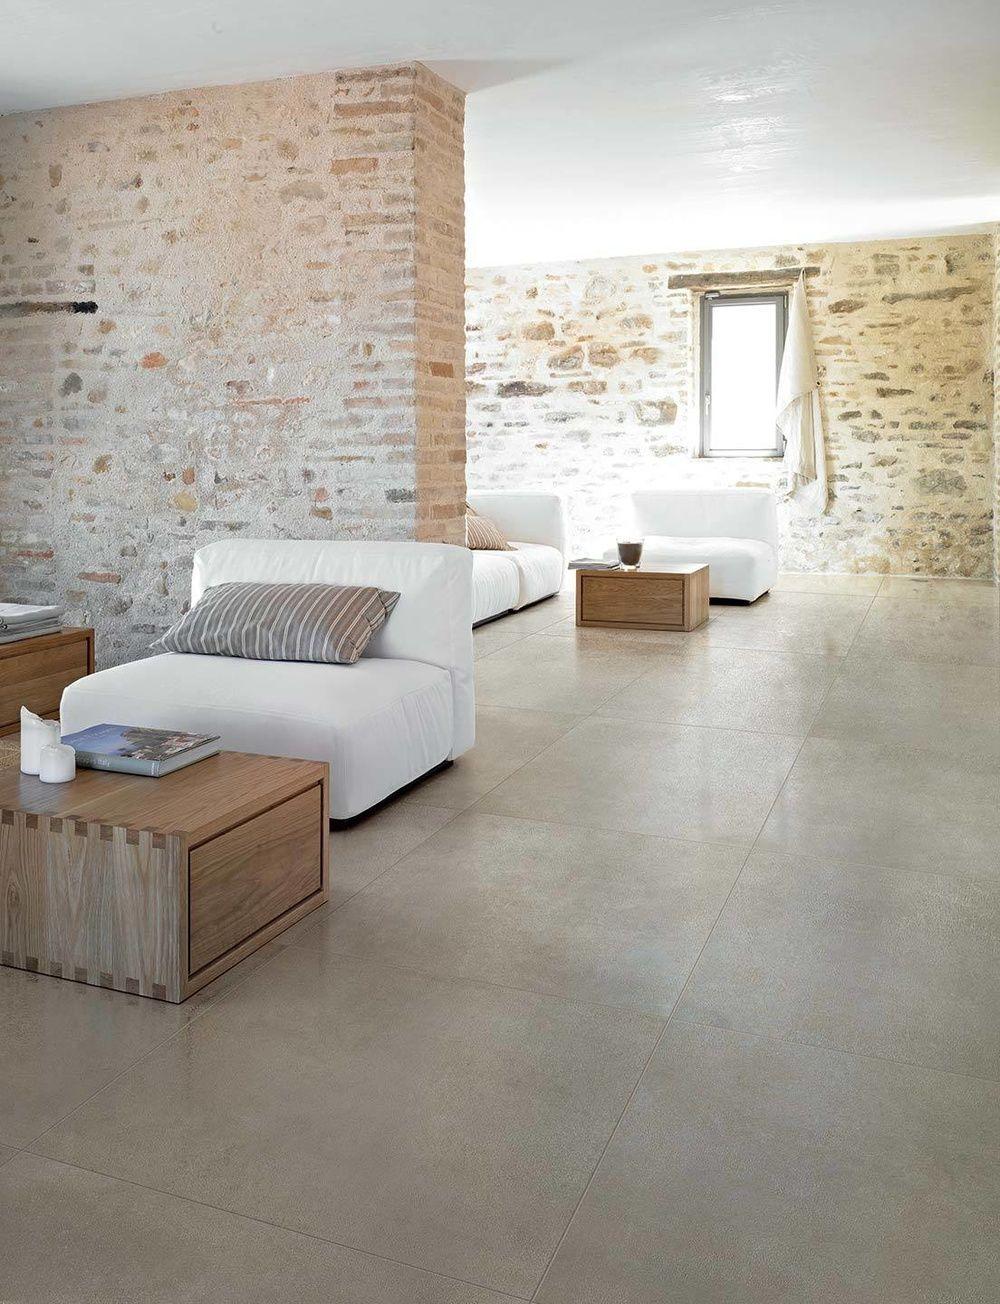 pin von cecilia palazuelos auf pisos in 2018 pinterest. Black Bedroom Furniture Sets. Home Design Ideas